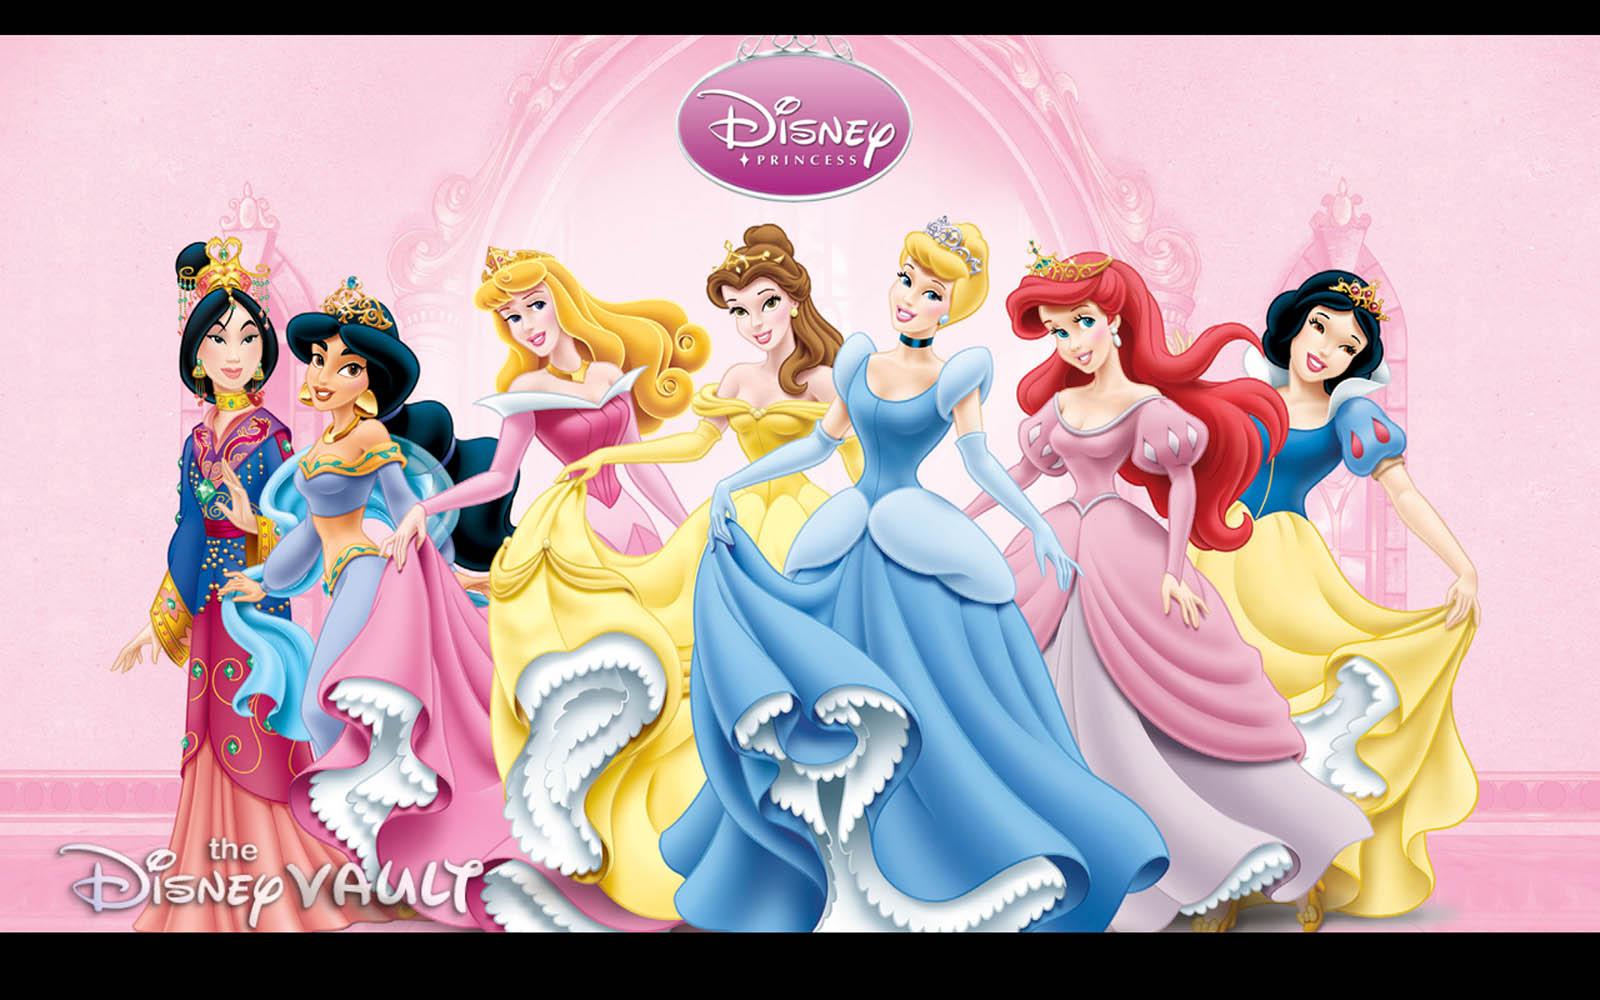 Disney Princess Wallpapers Download 1600x1000